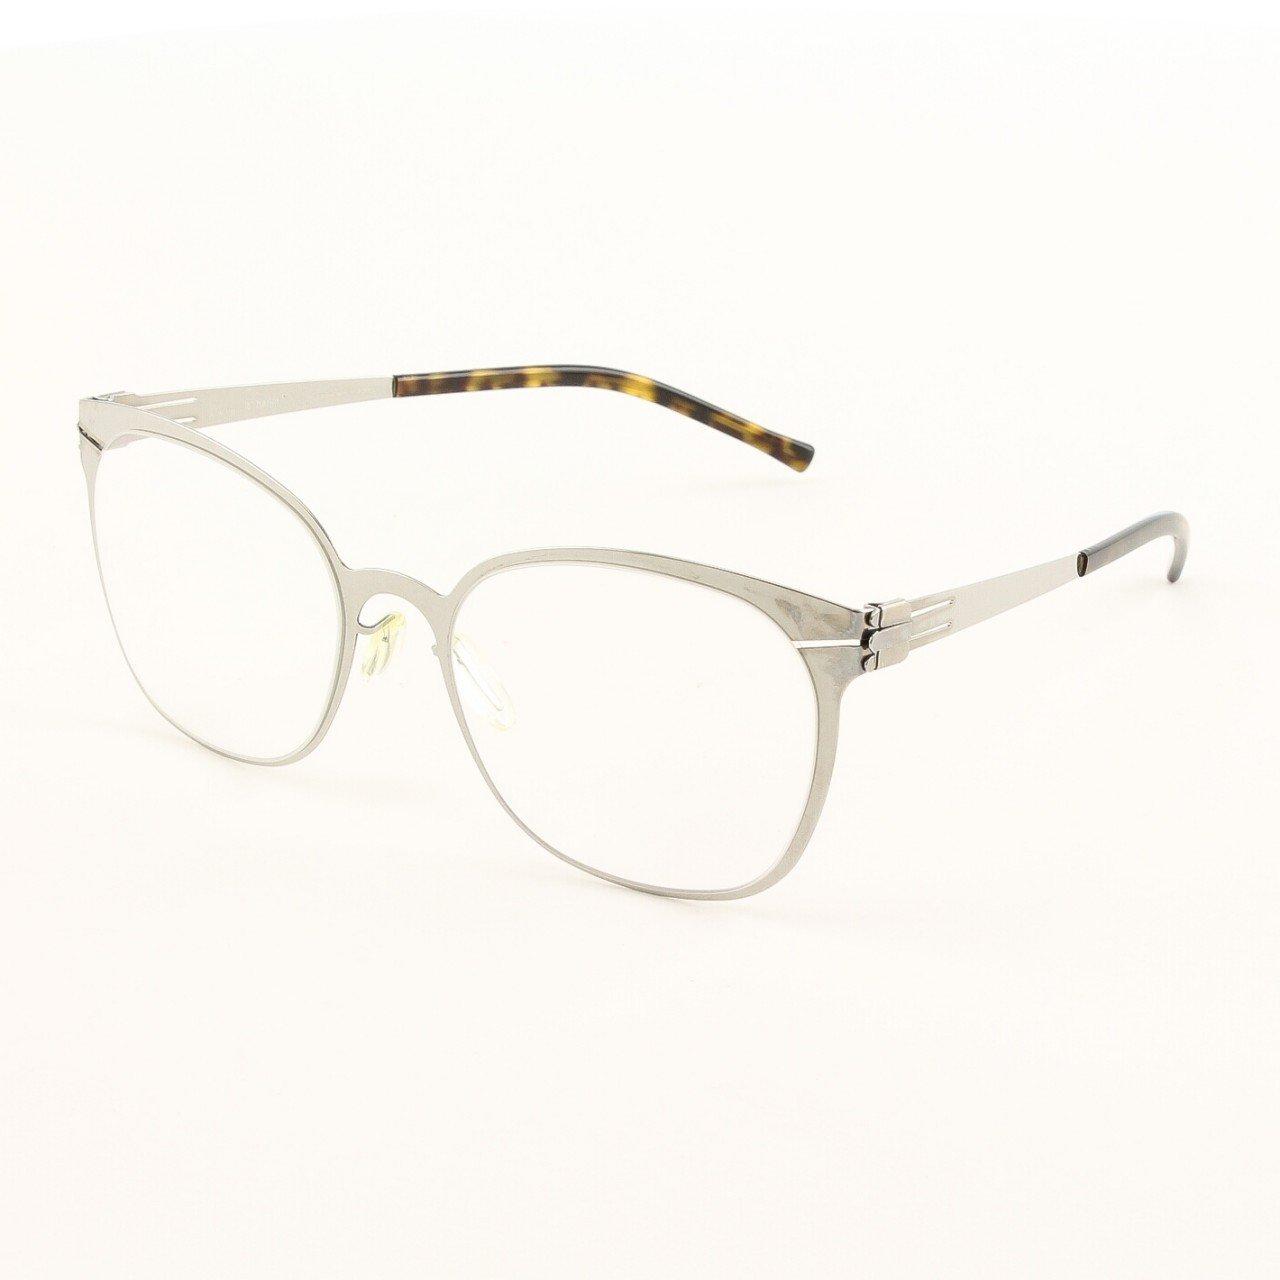 ic! Berlin Samedi Eyeglasses Col. Chrome with Clear Lenses